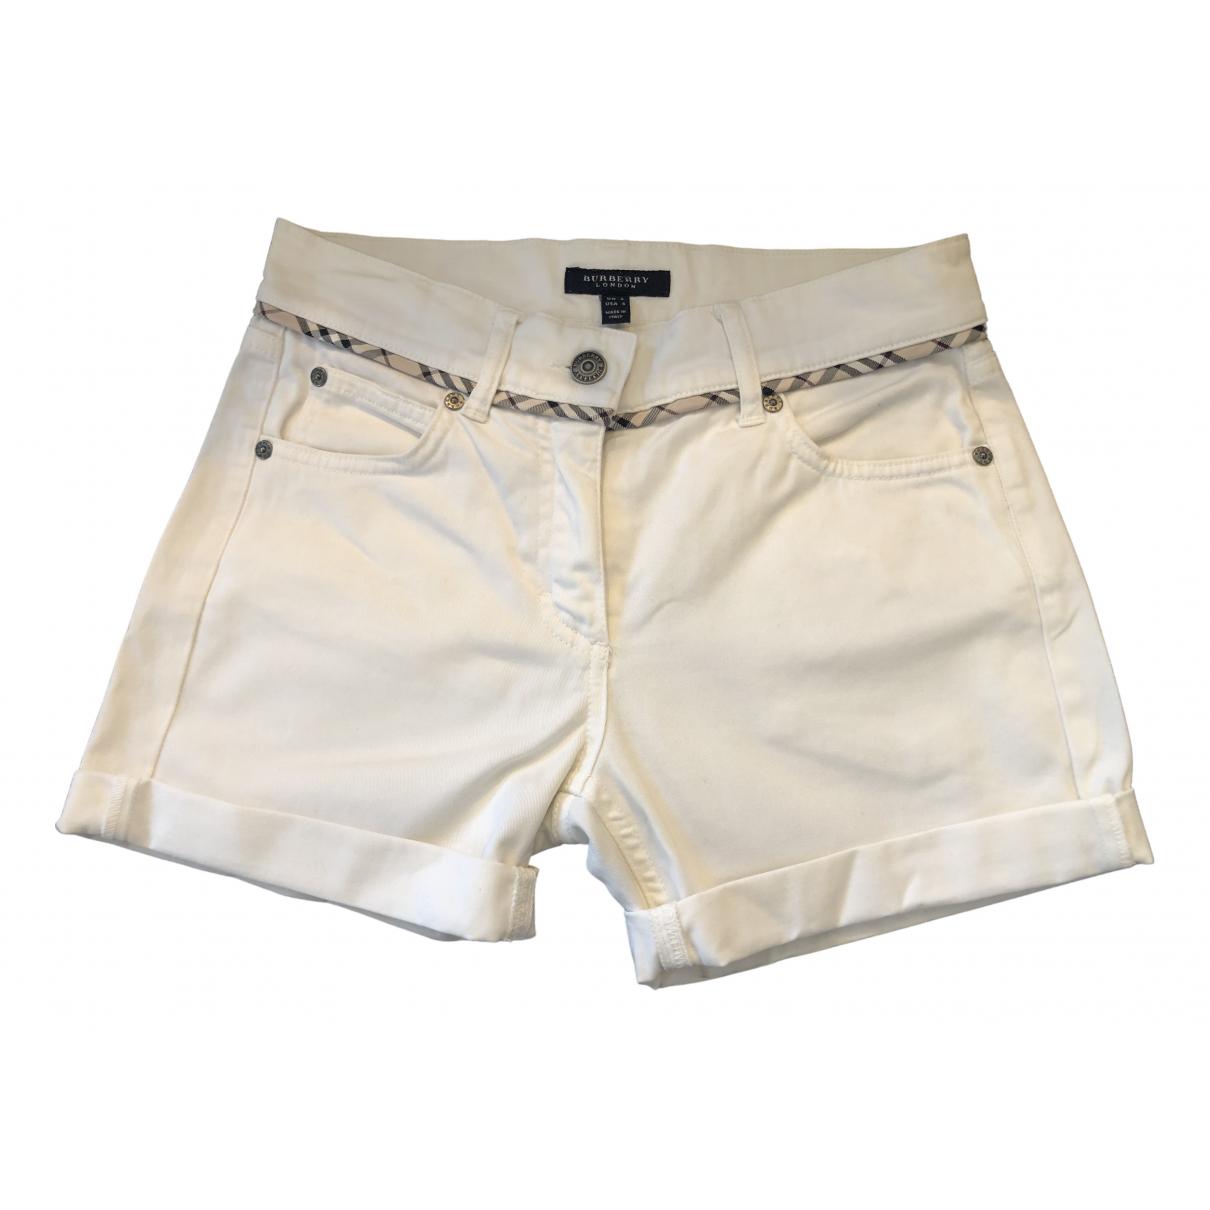 Burberry \N Shorts in  Weiss Baumwolle - Elasthan